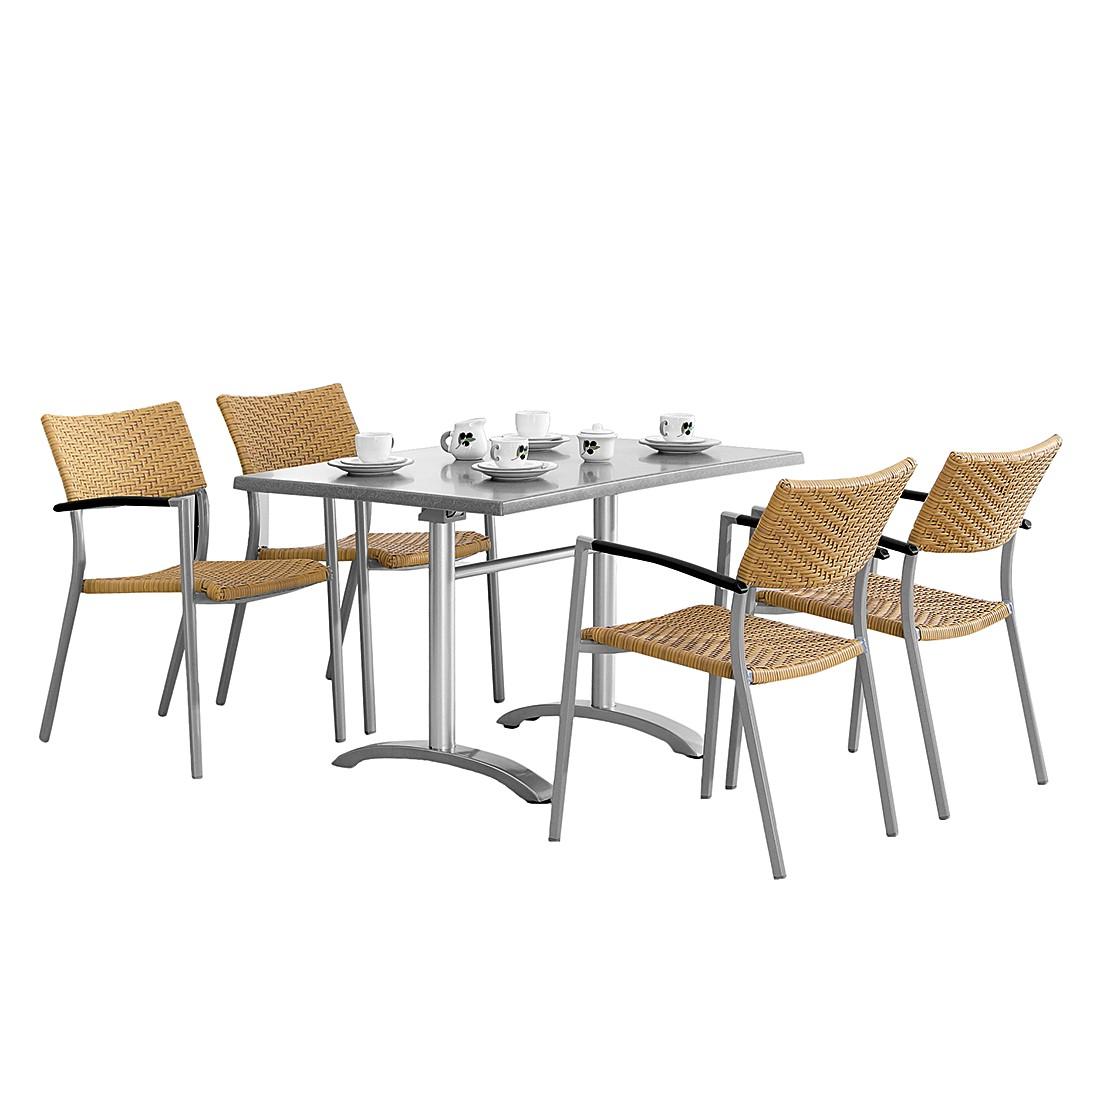 Gartensitzgruppe Albany (5-teilig) - Aluminium/Werzalit, Best Freizeitmöbel